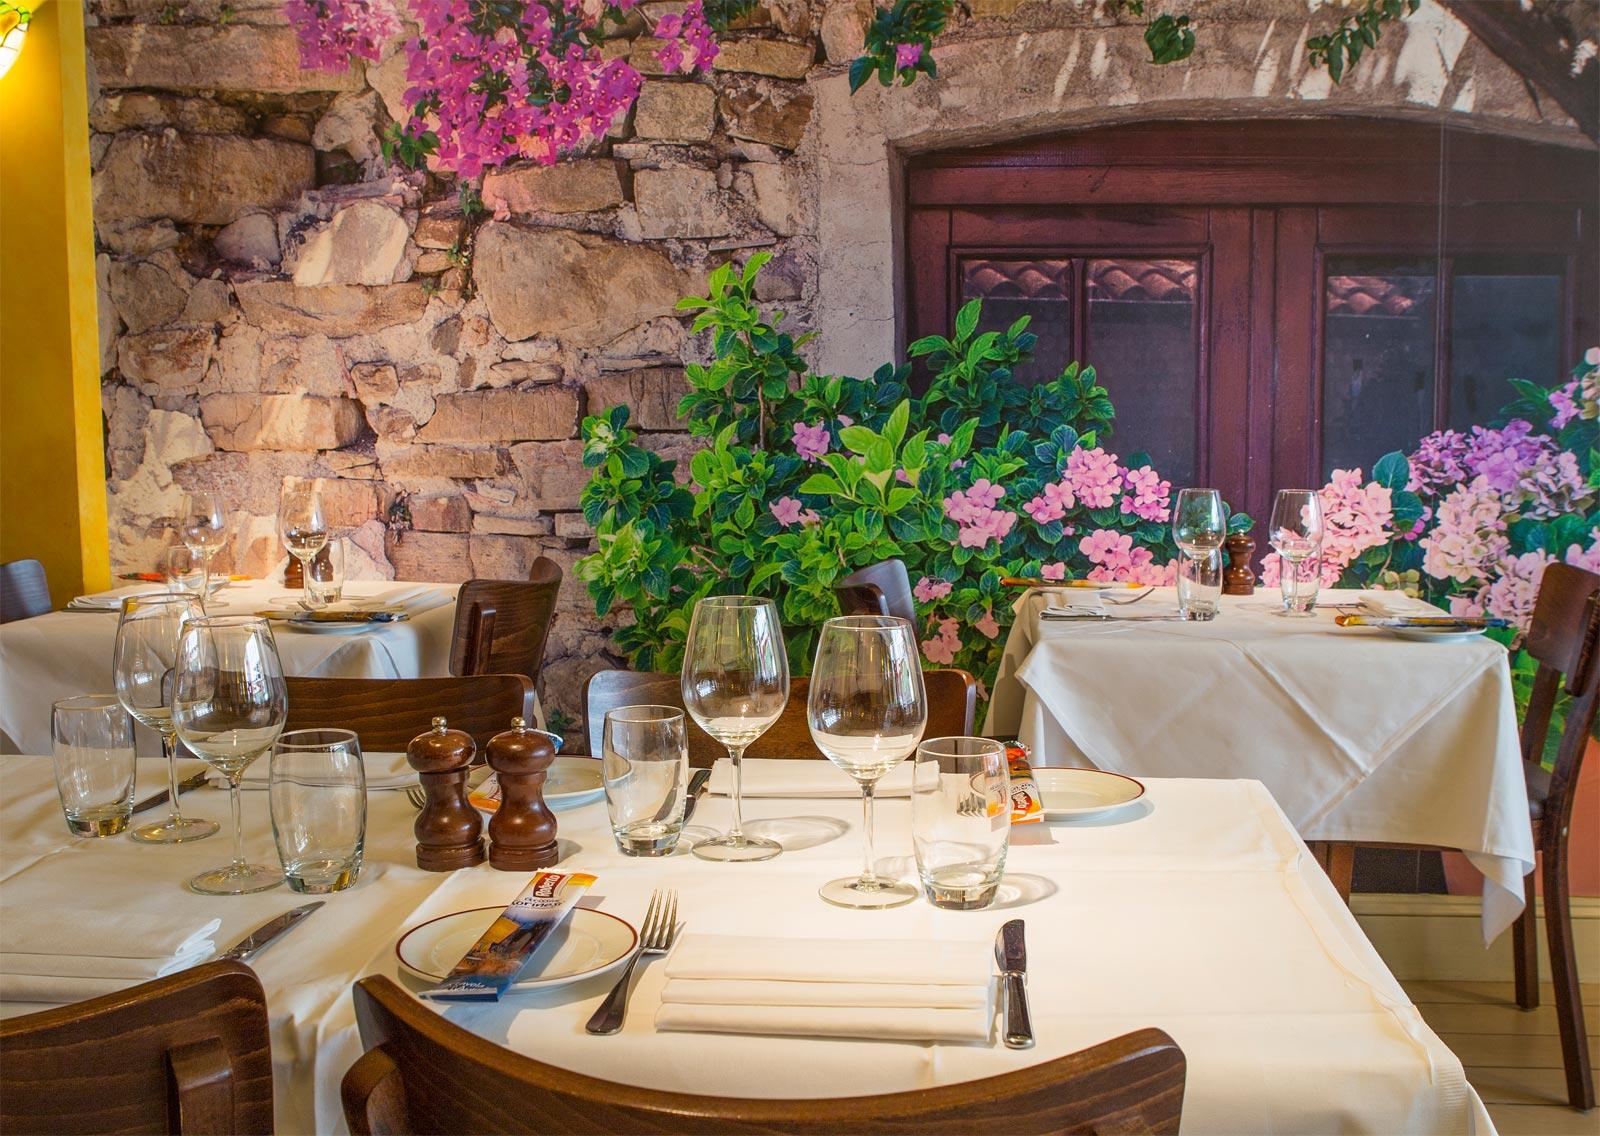 Vicino: Italian Comfort Food at its Finest 8